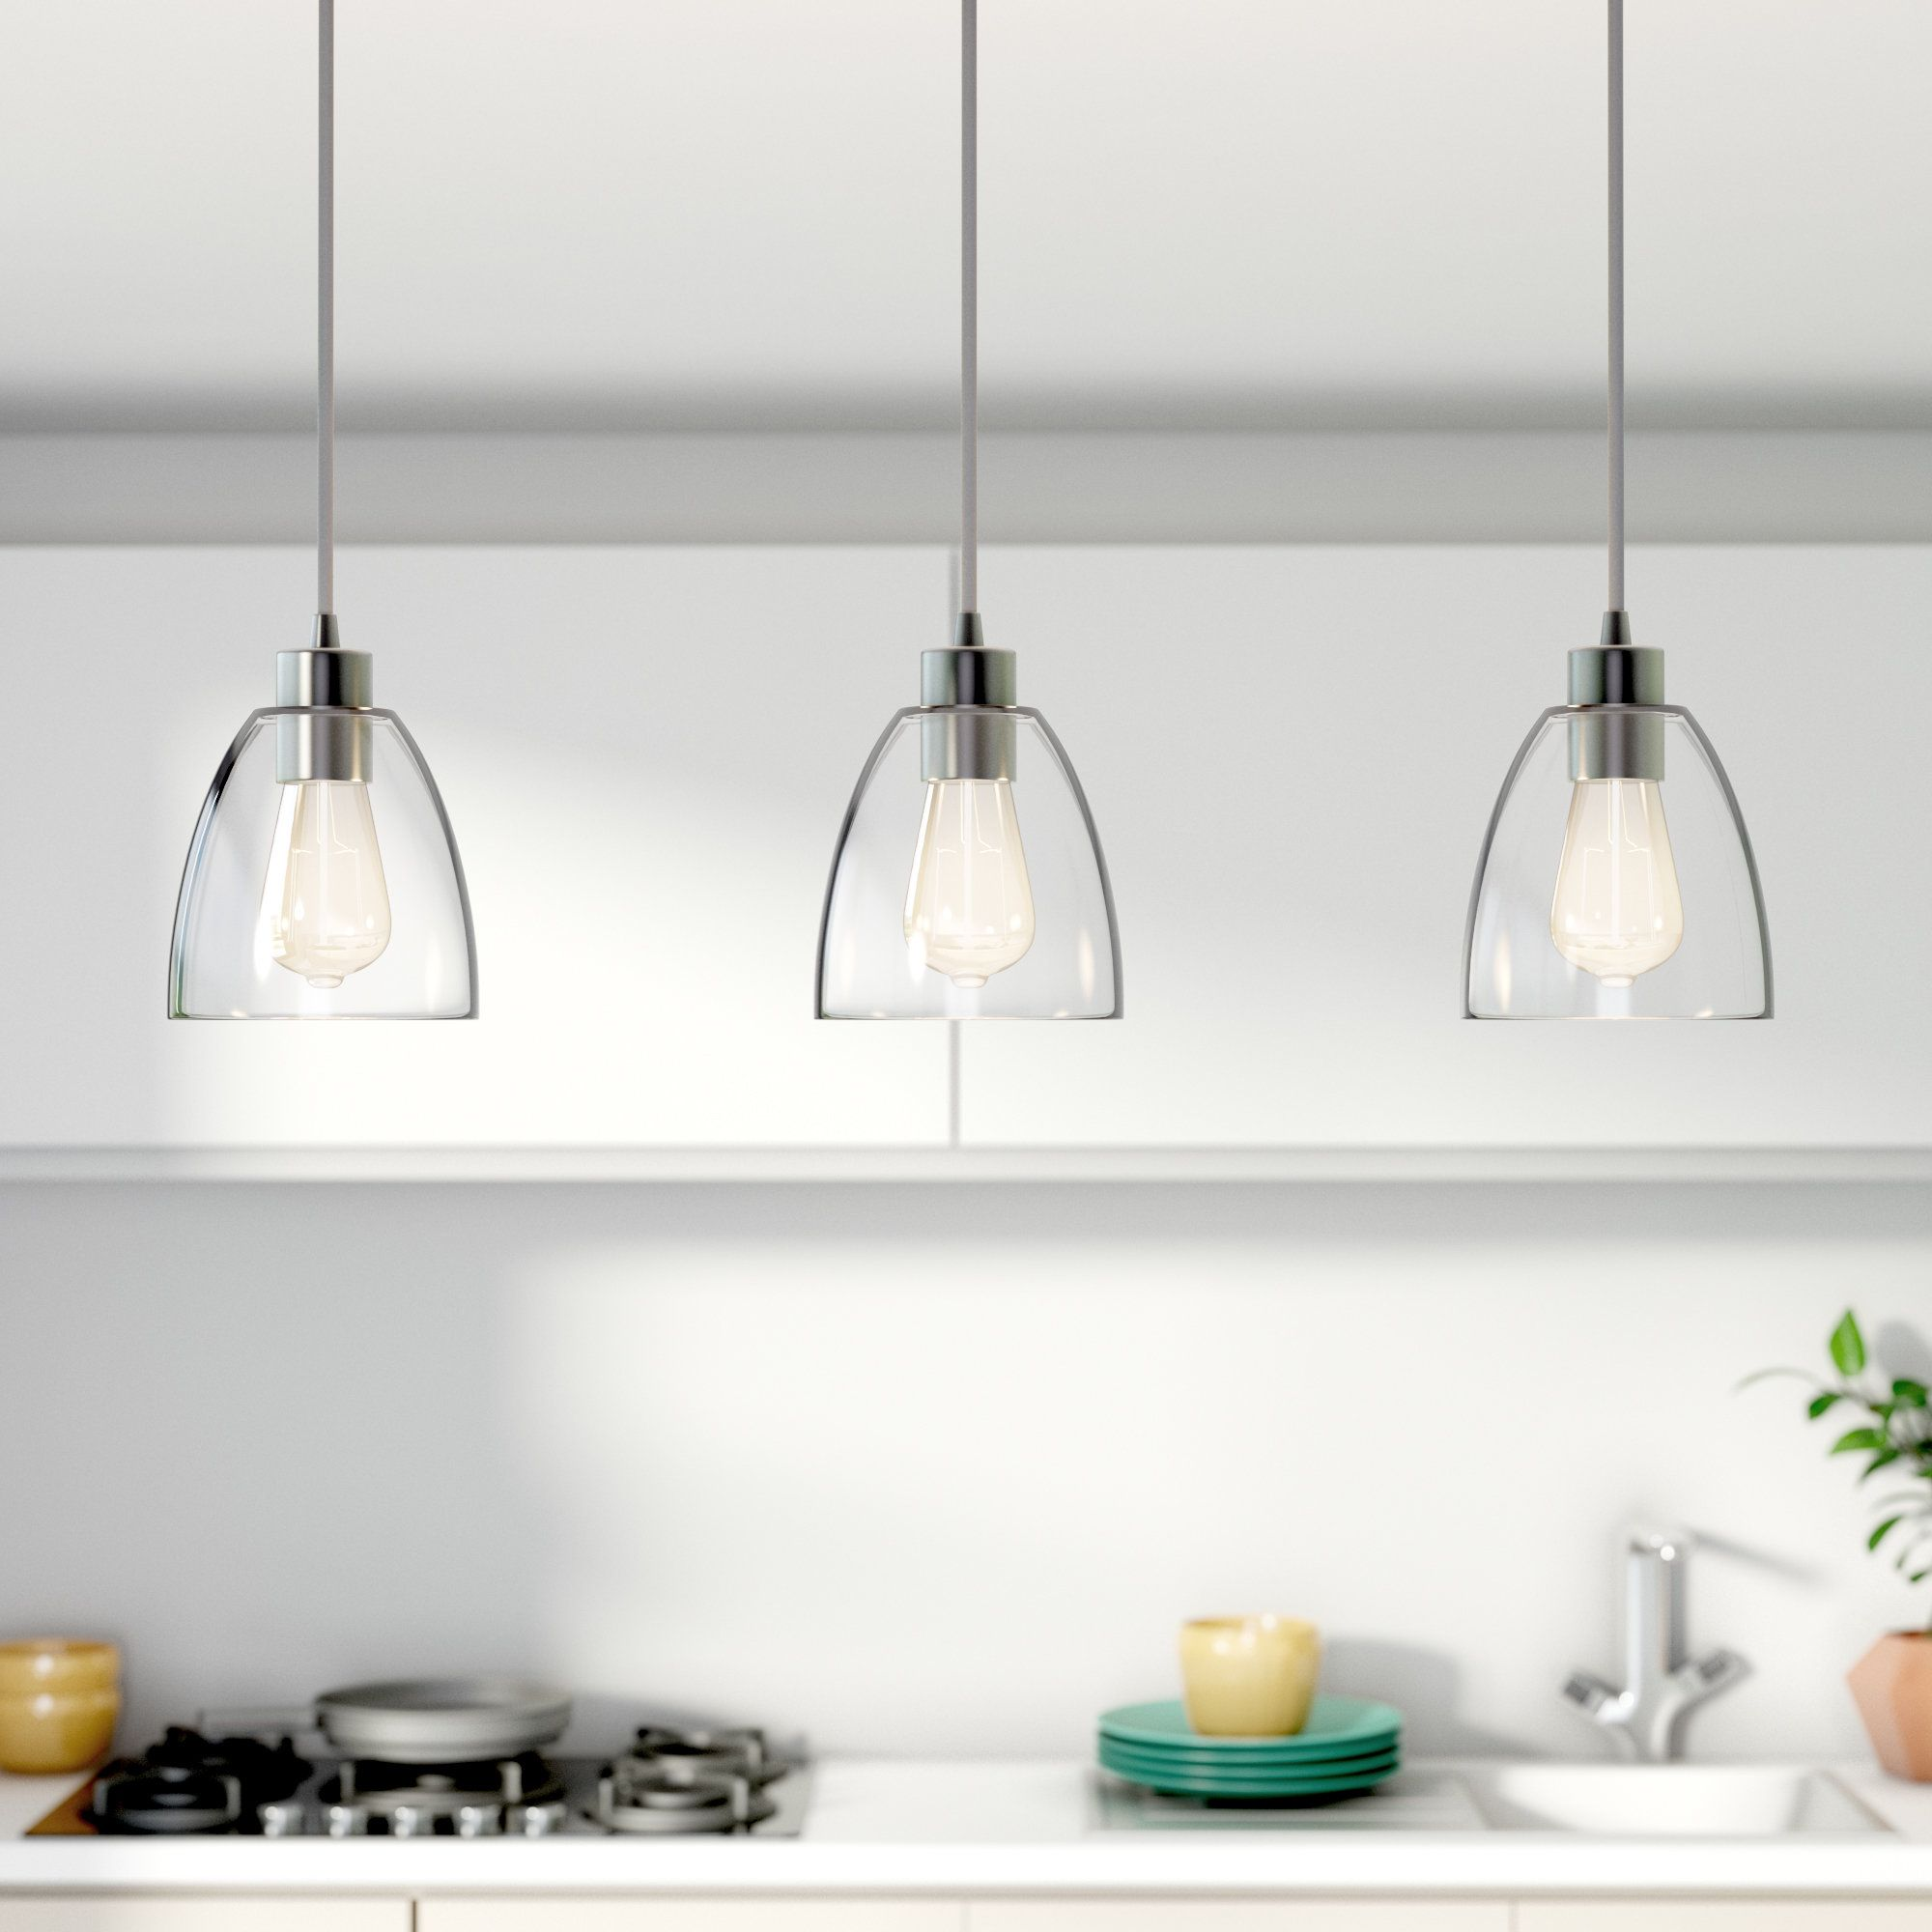 Cadorette 3-Light Kitchen Island Pendant | Products ...